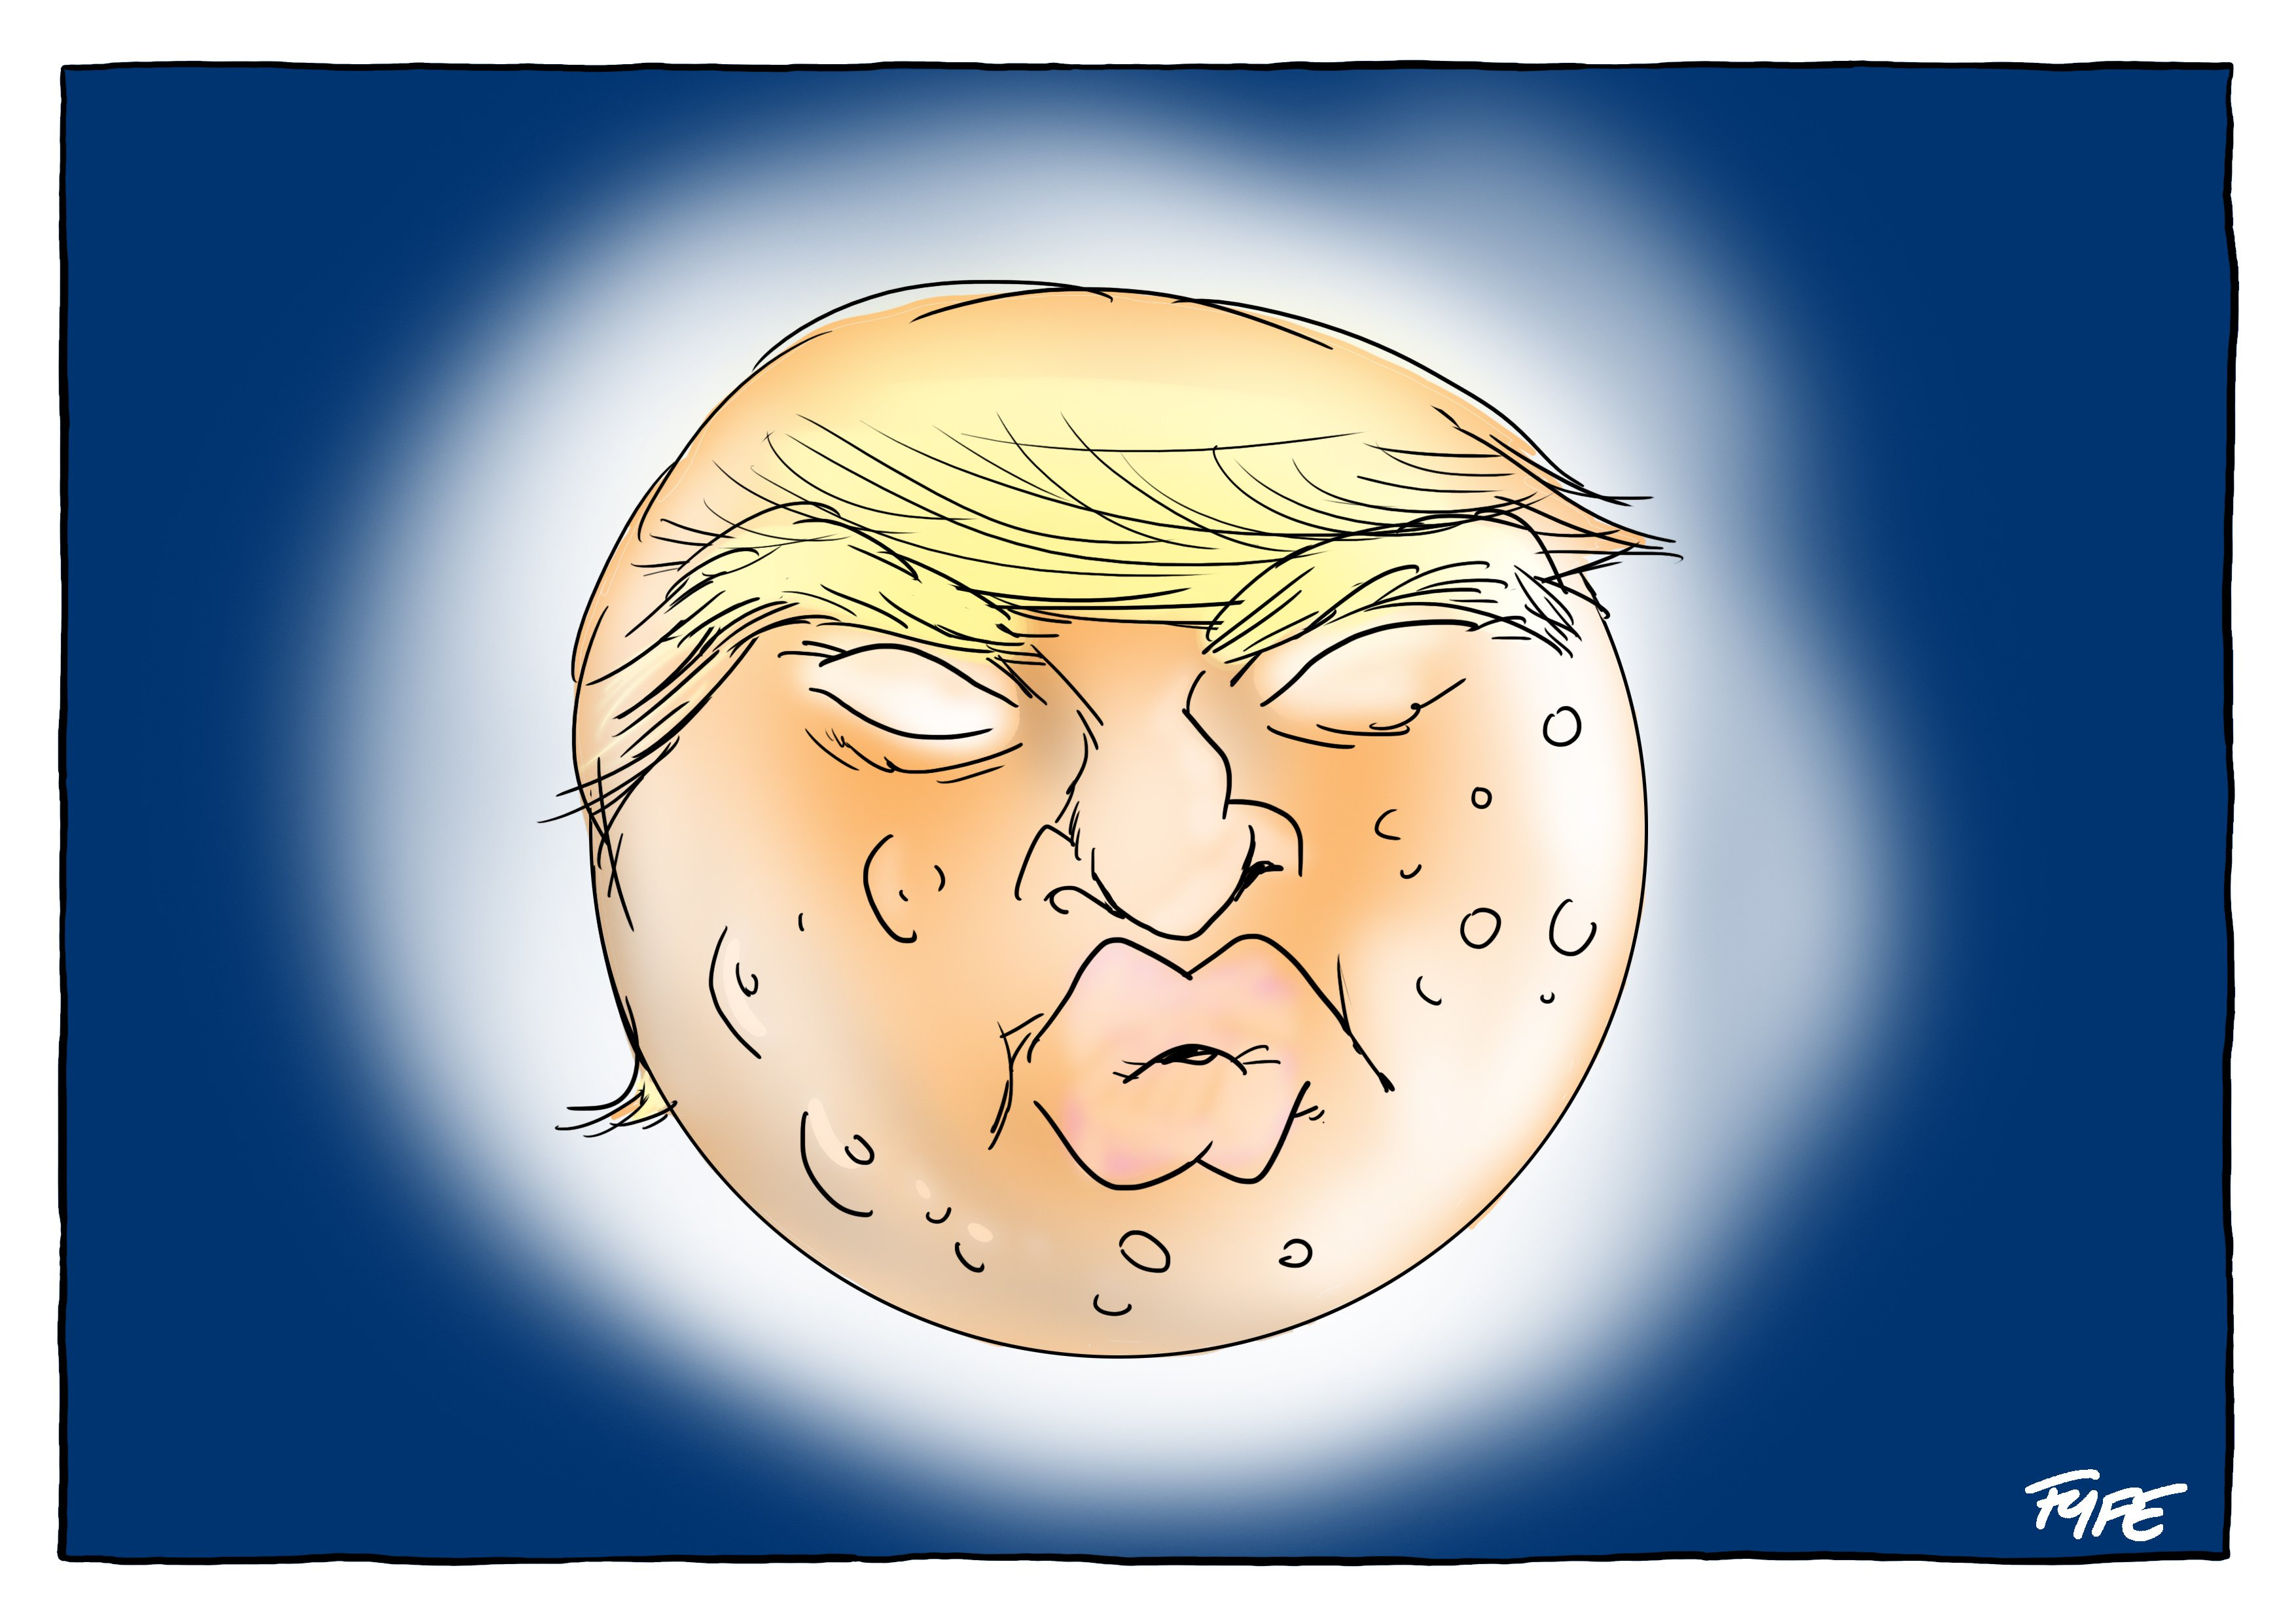 Supermoon, Trump, Donald Trump, Trump cartoon, Donald Trump cartoon